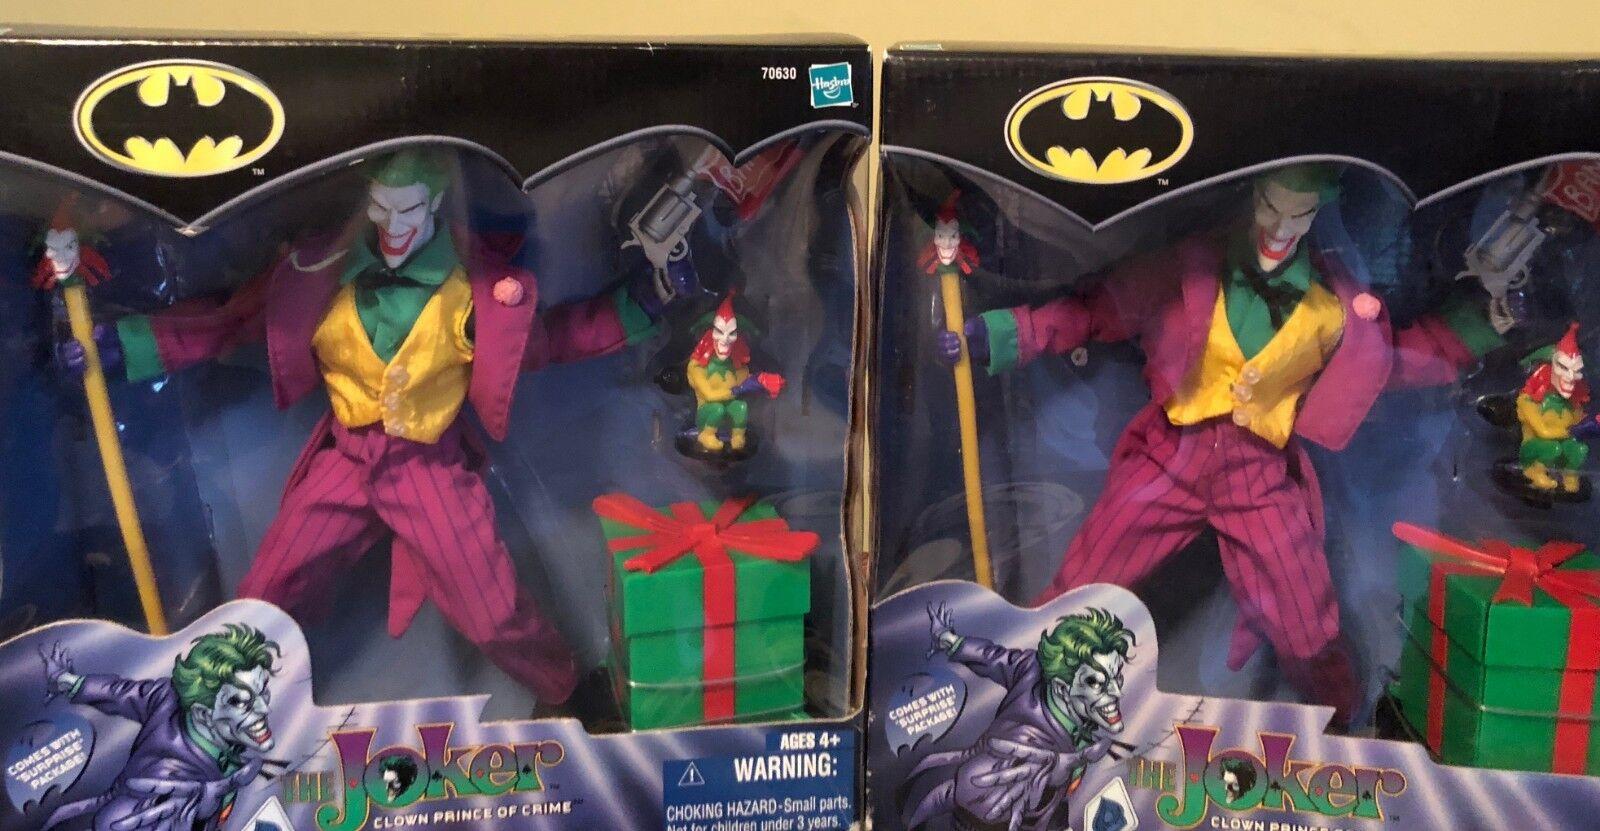 Anzahl 2 batman joker clown prinz von verbrechen